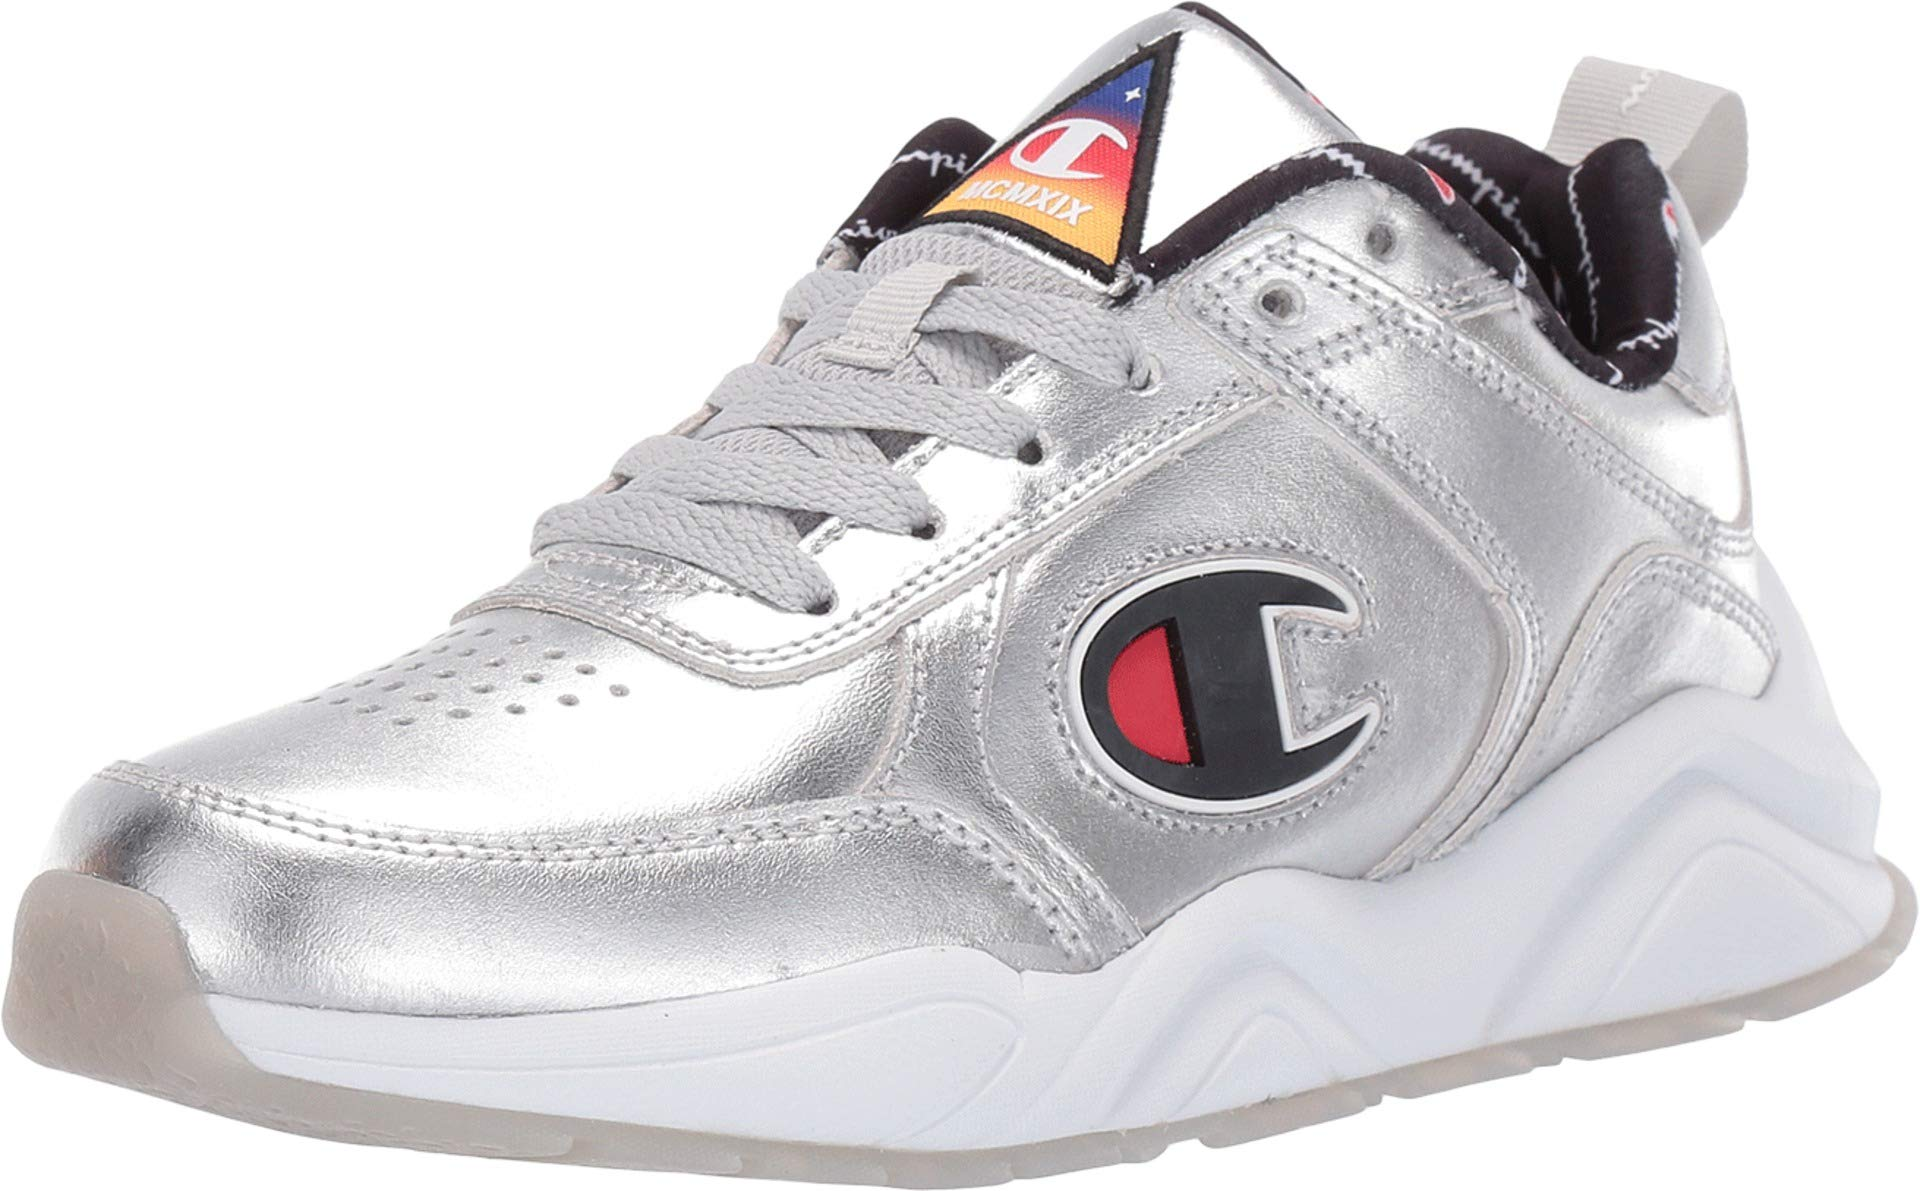 Champion Youth GS 93 Eighteen NASA Metallic Sneaker in Silver-Silver_7